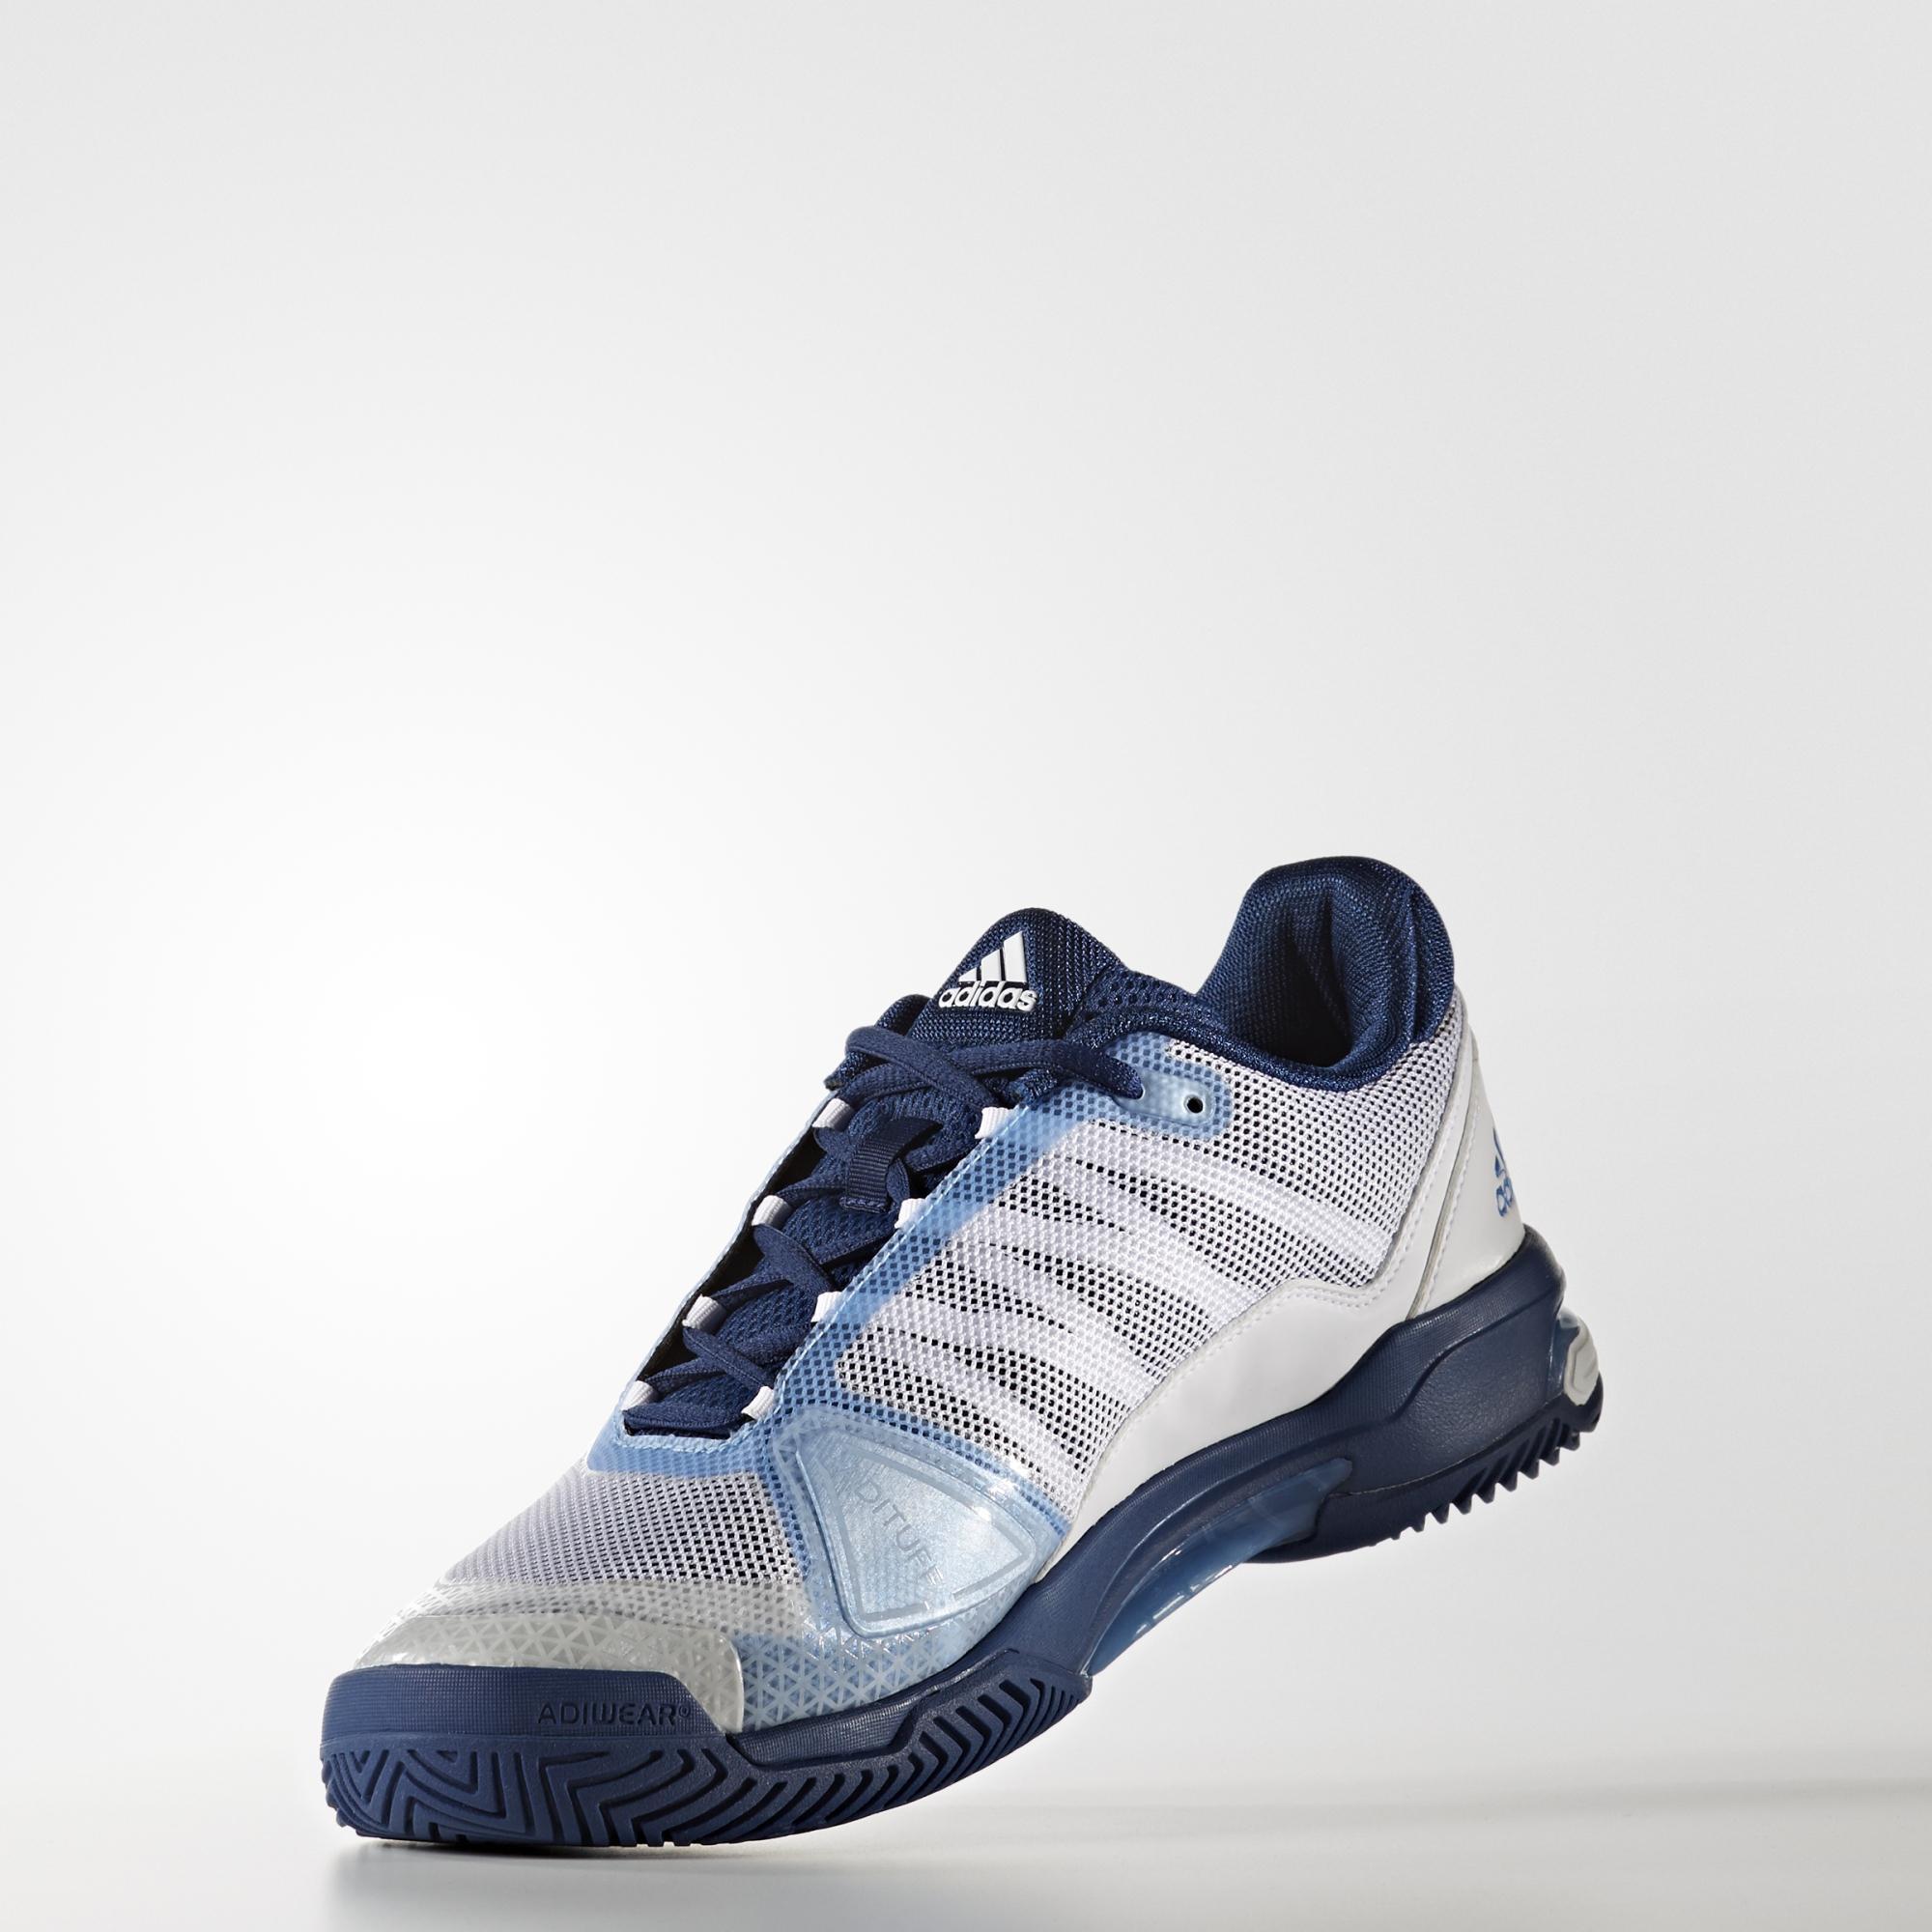 new arrival be367 e63a8 Adidas Mens Barricade Club (2017) Tennis Shoes - White Tech Blue